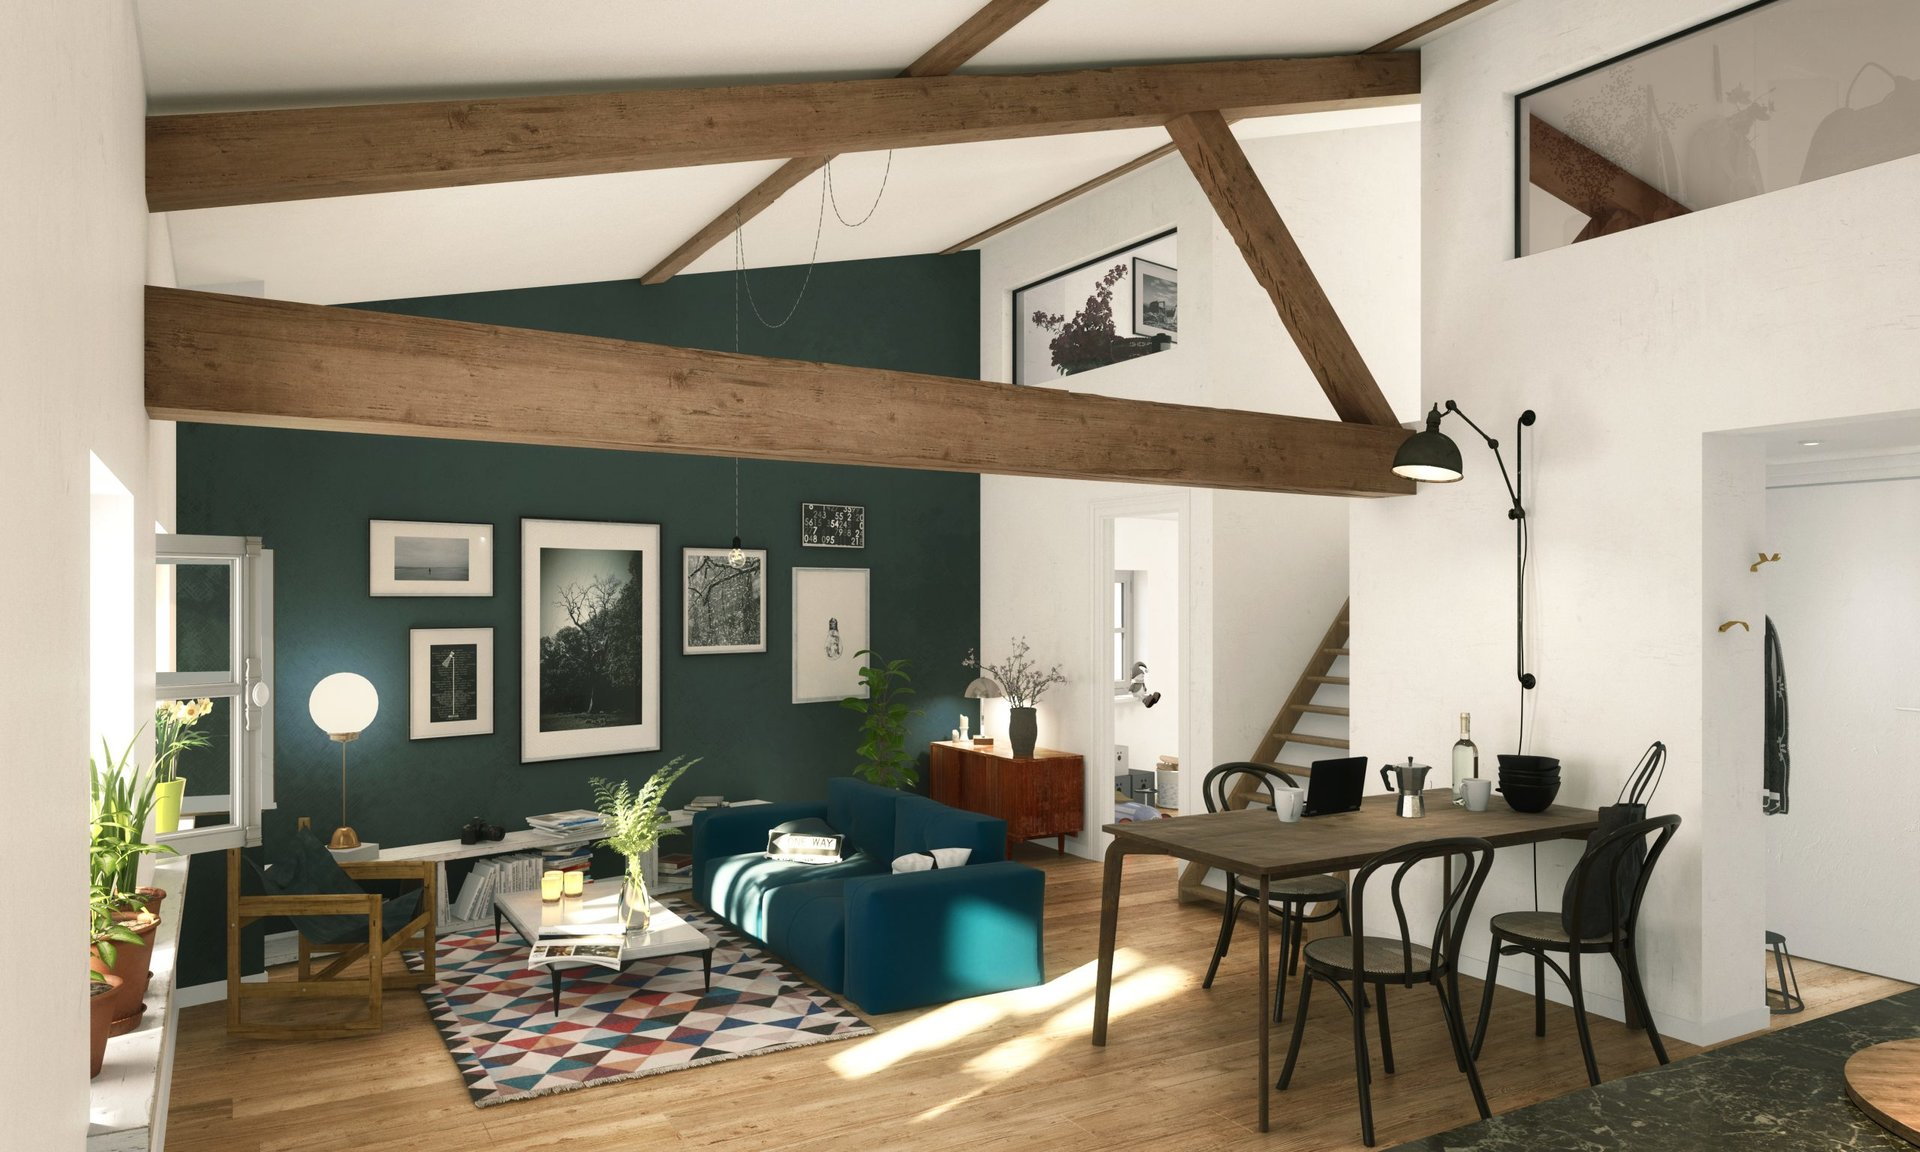 Vente Duplex - Albigny-sur-Saône